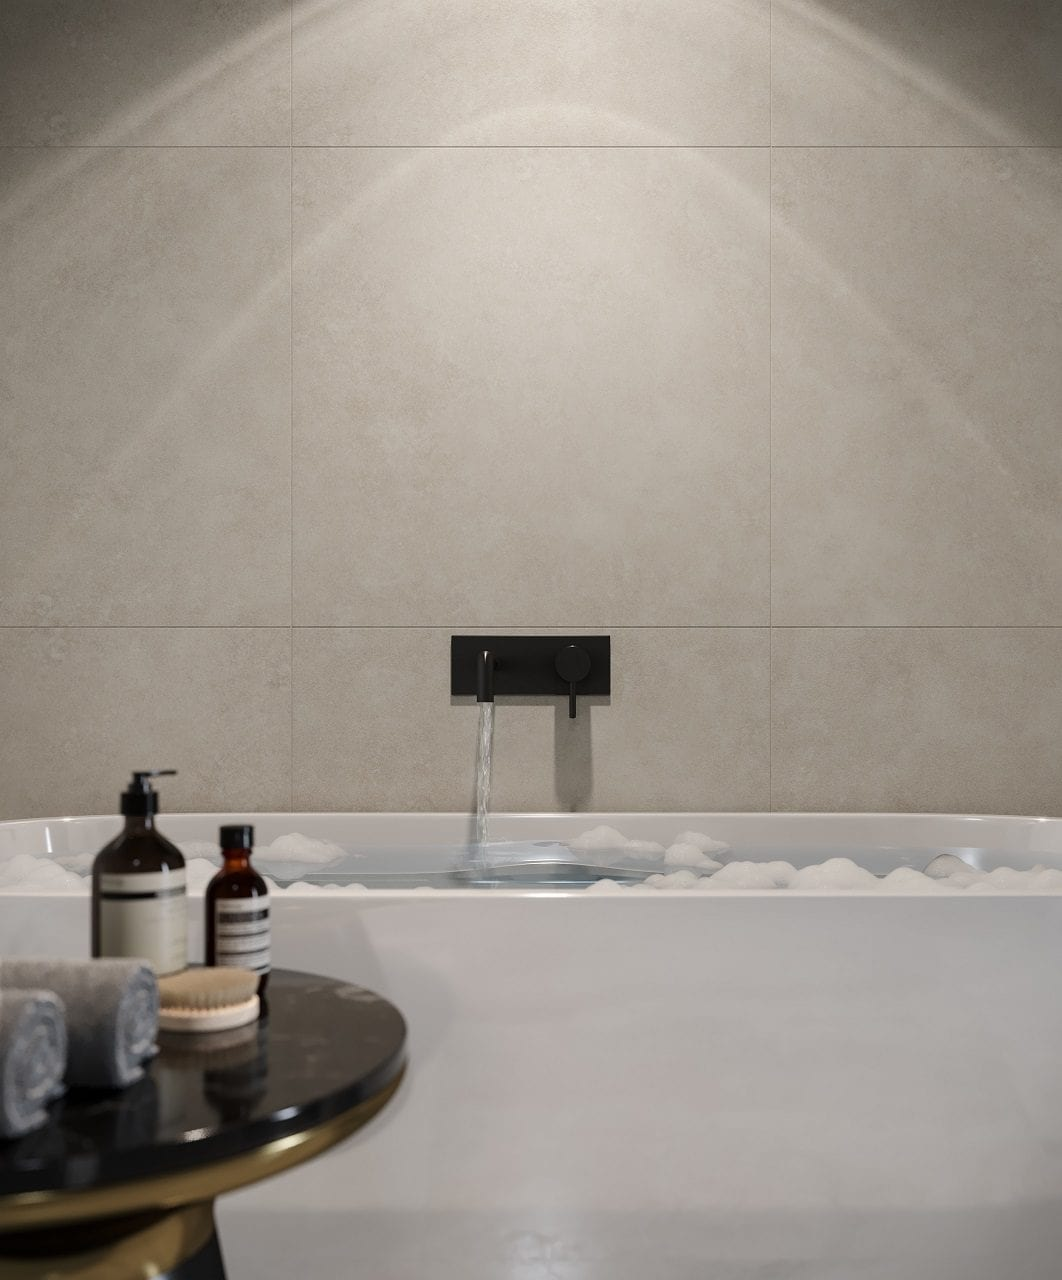 Raeon-Cornelia-Edition-AZU1275_KeonaRd_S120_INT_BathroomVignette_Final 2000